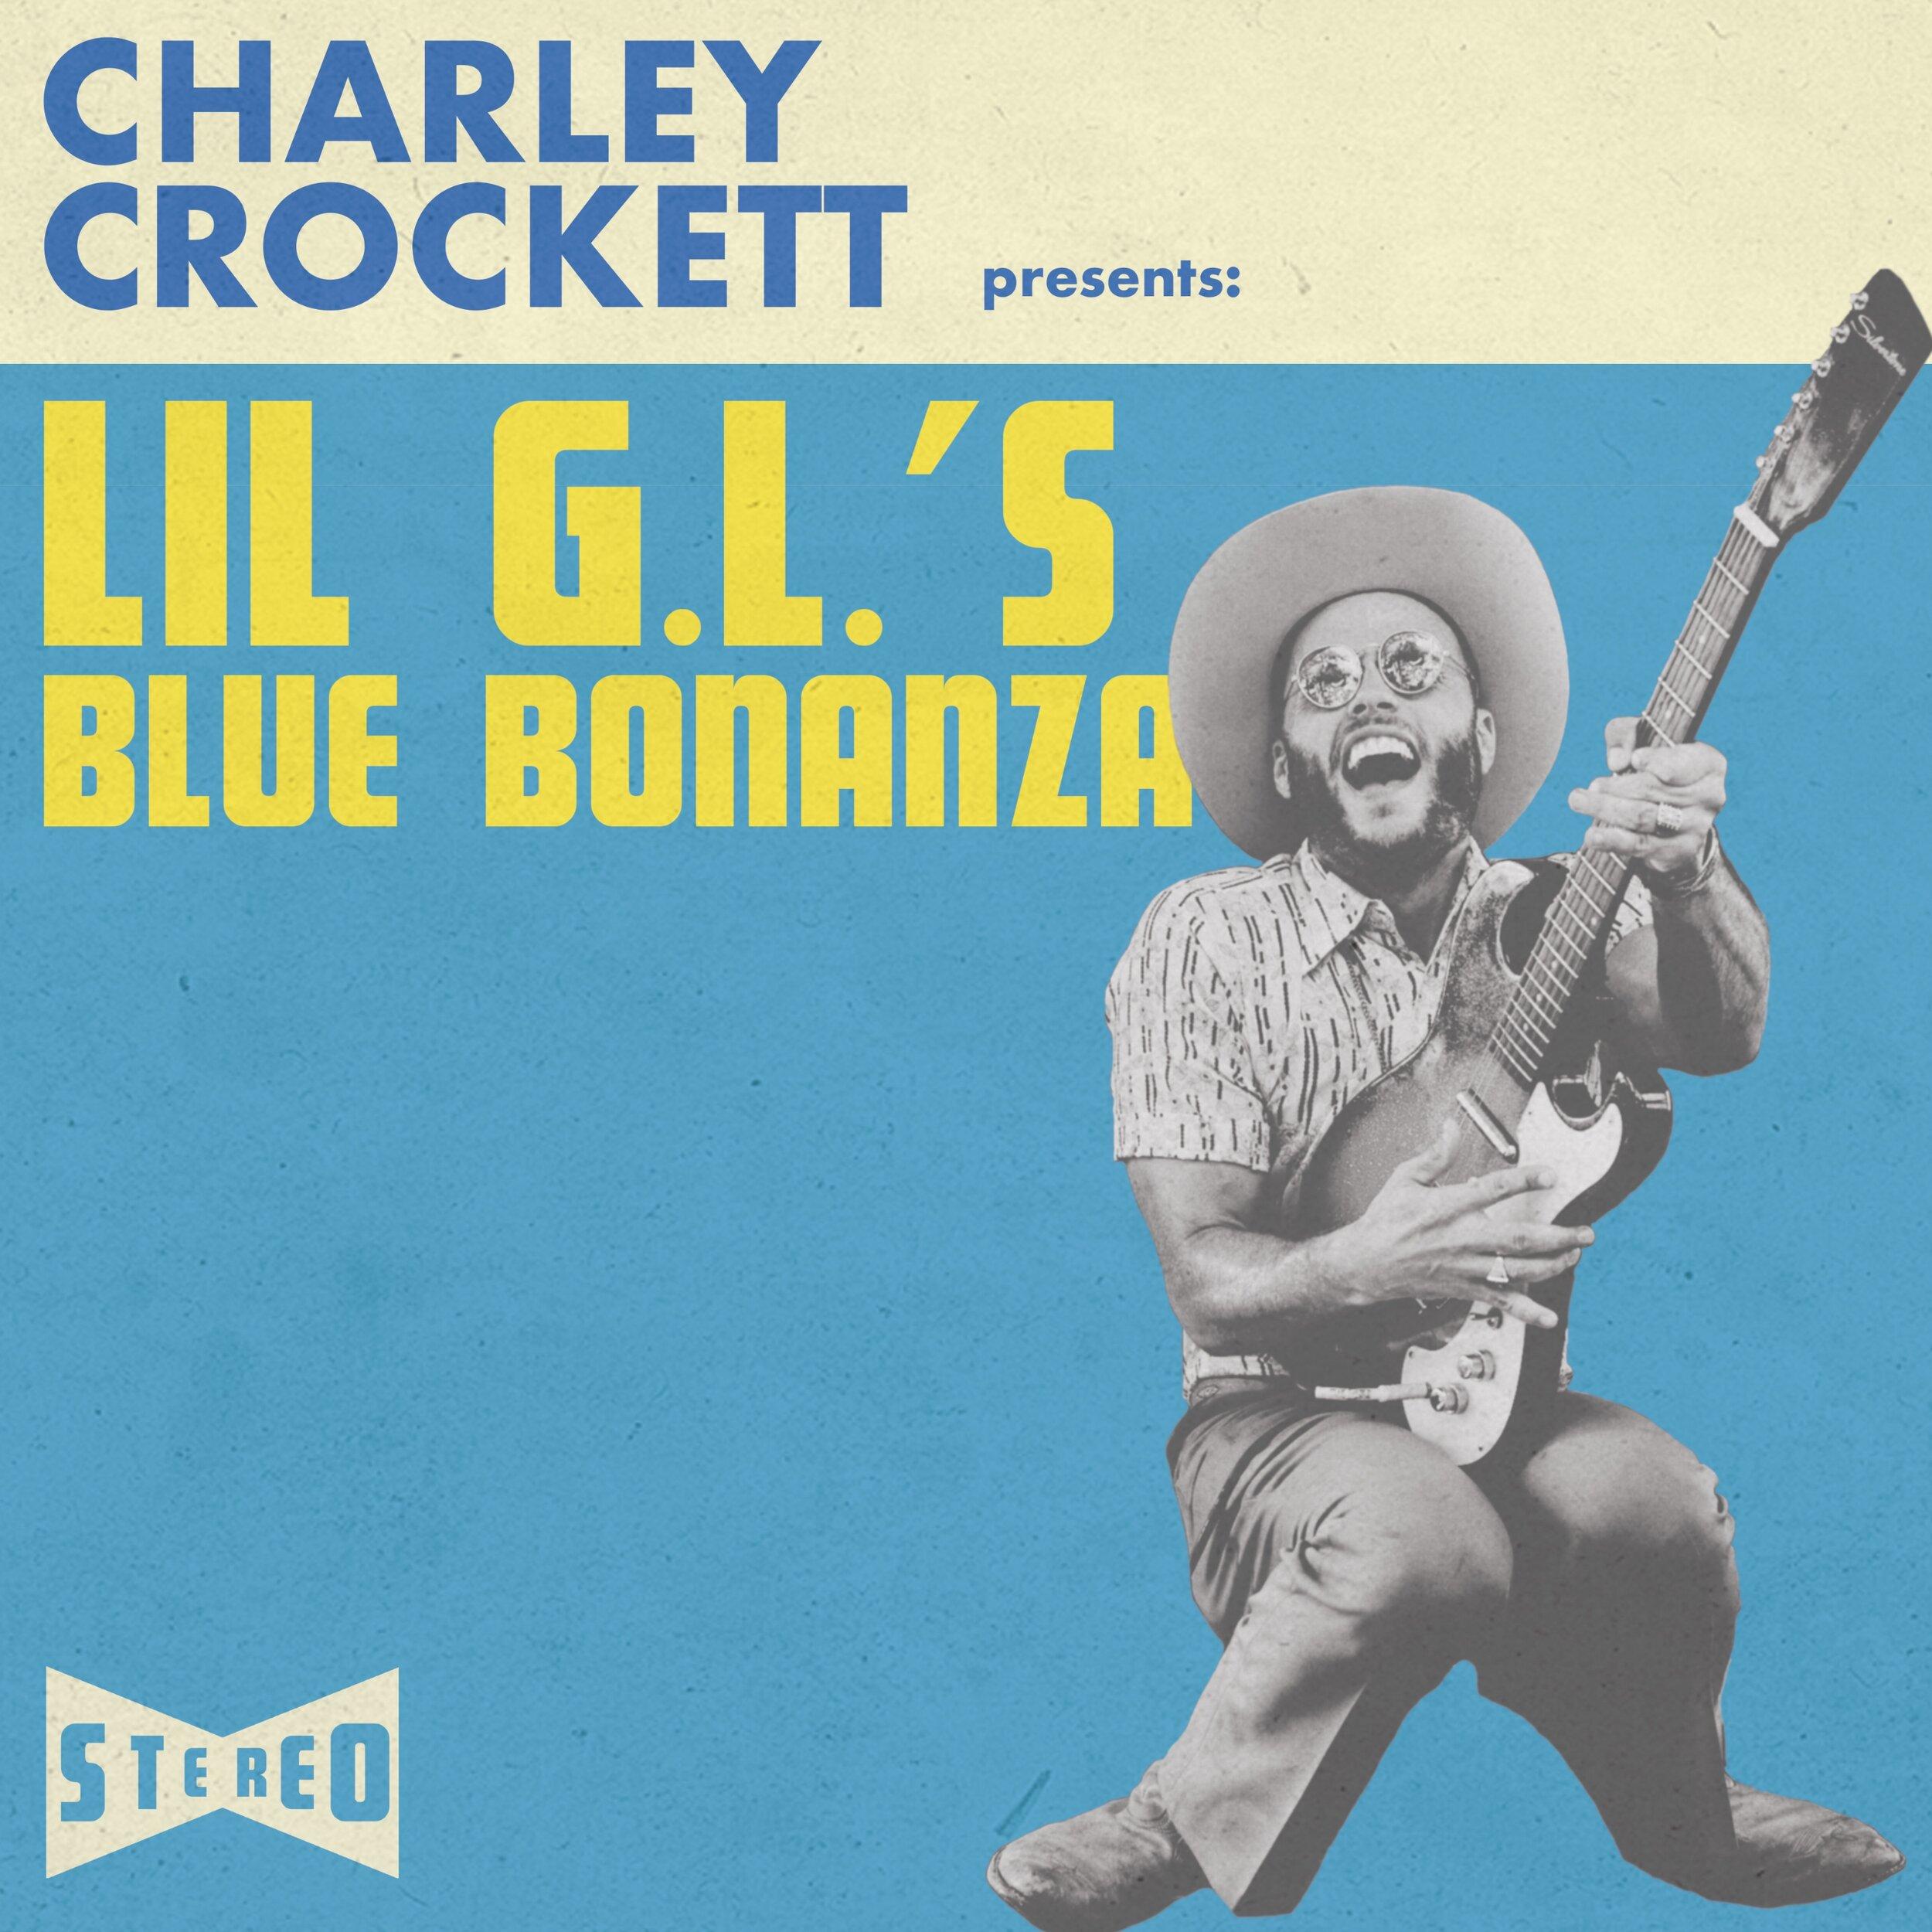 CHARLEY CROCKETT BB DIGITAL.jpg